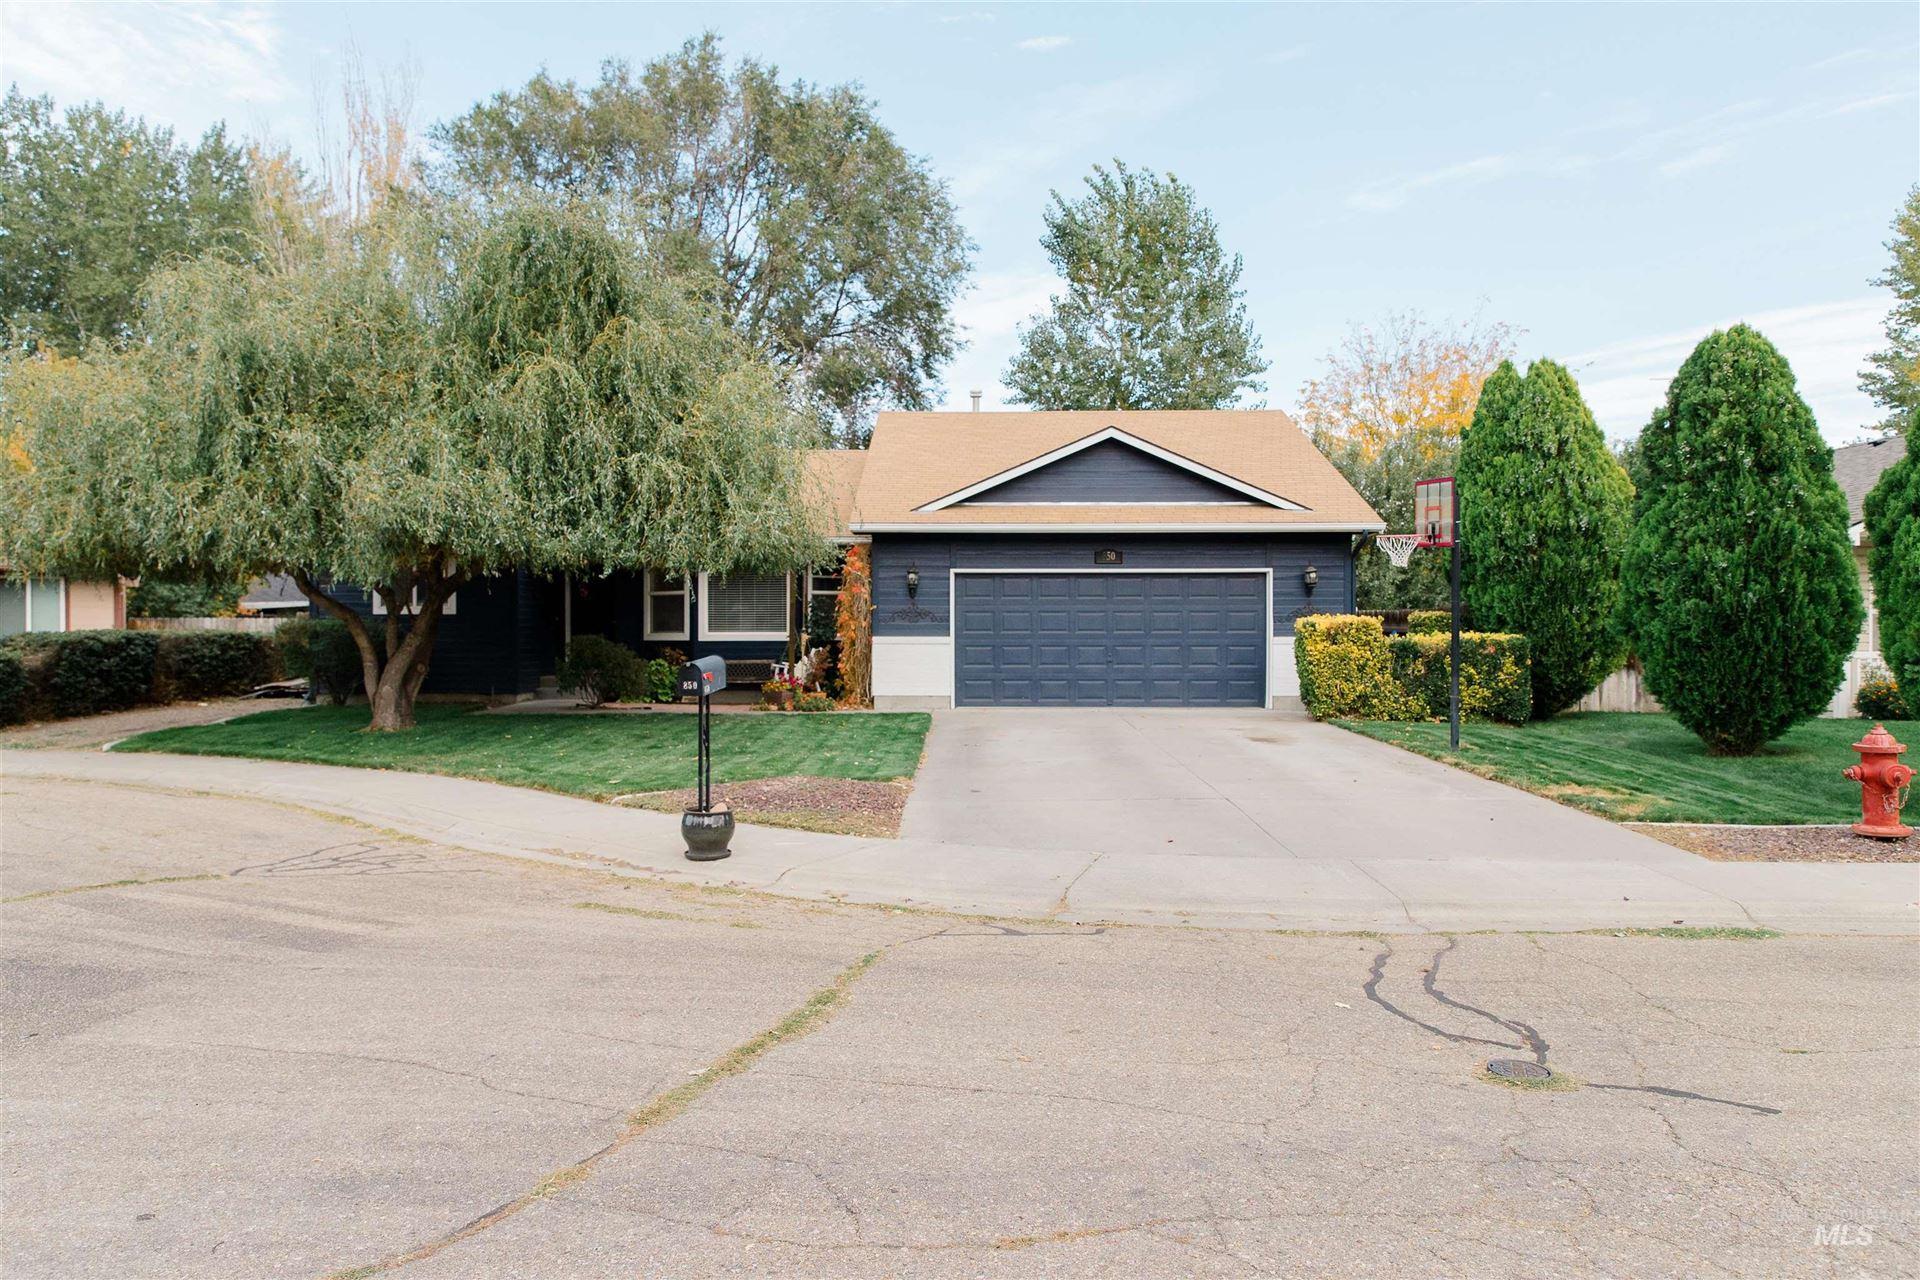 850 Aspen Pl, Mountain Home, ID 83647 - MLS#: 98822661